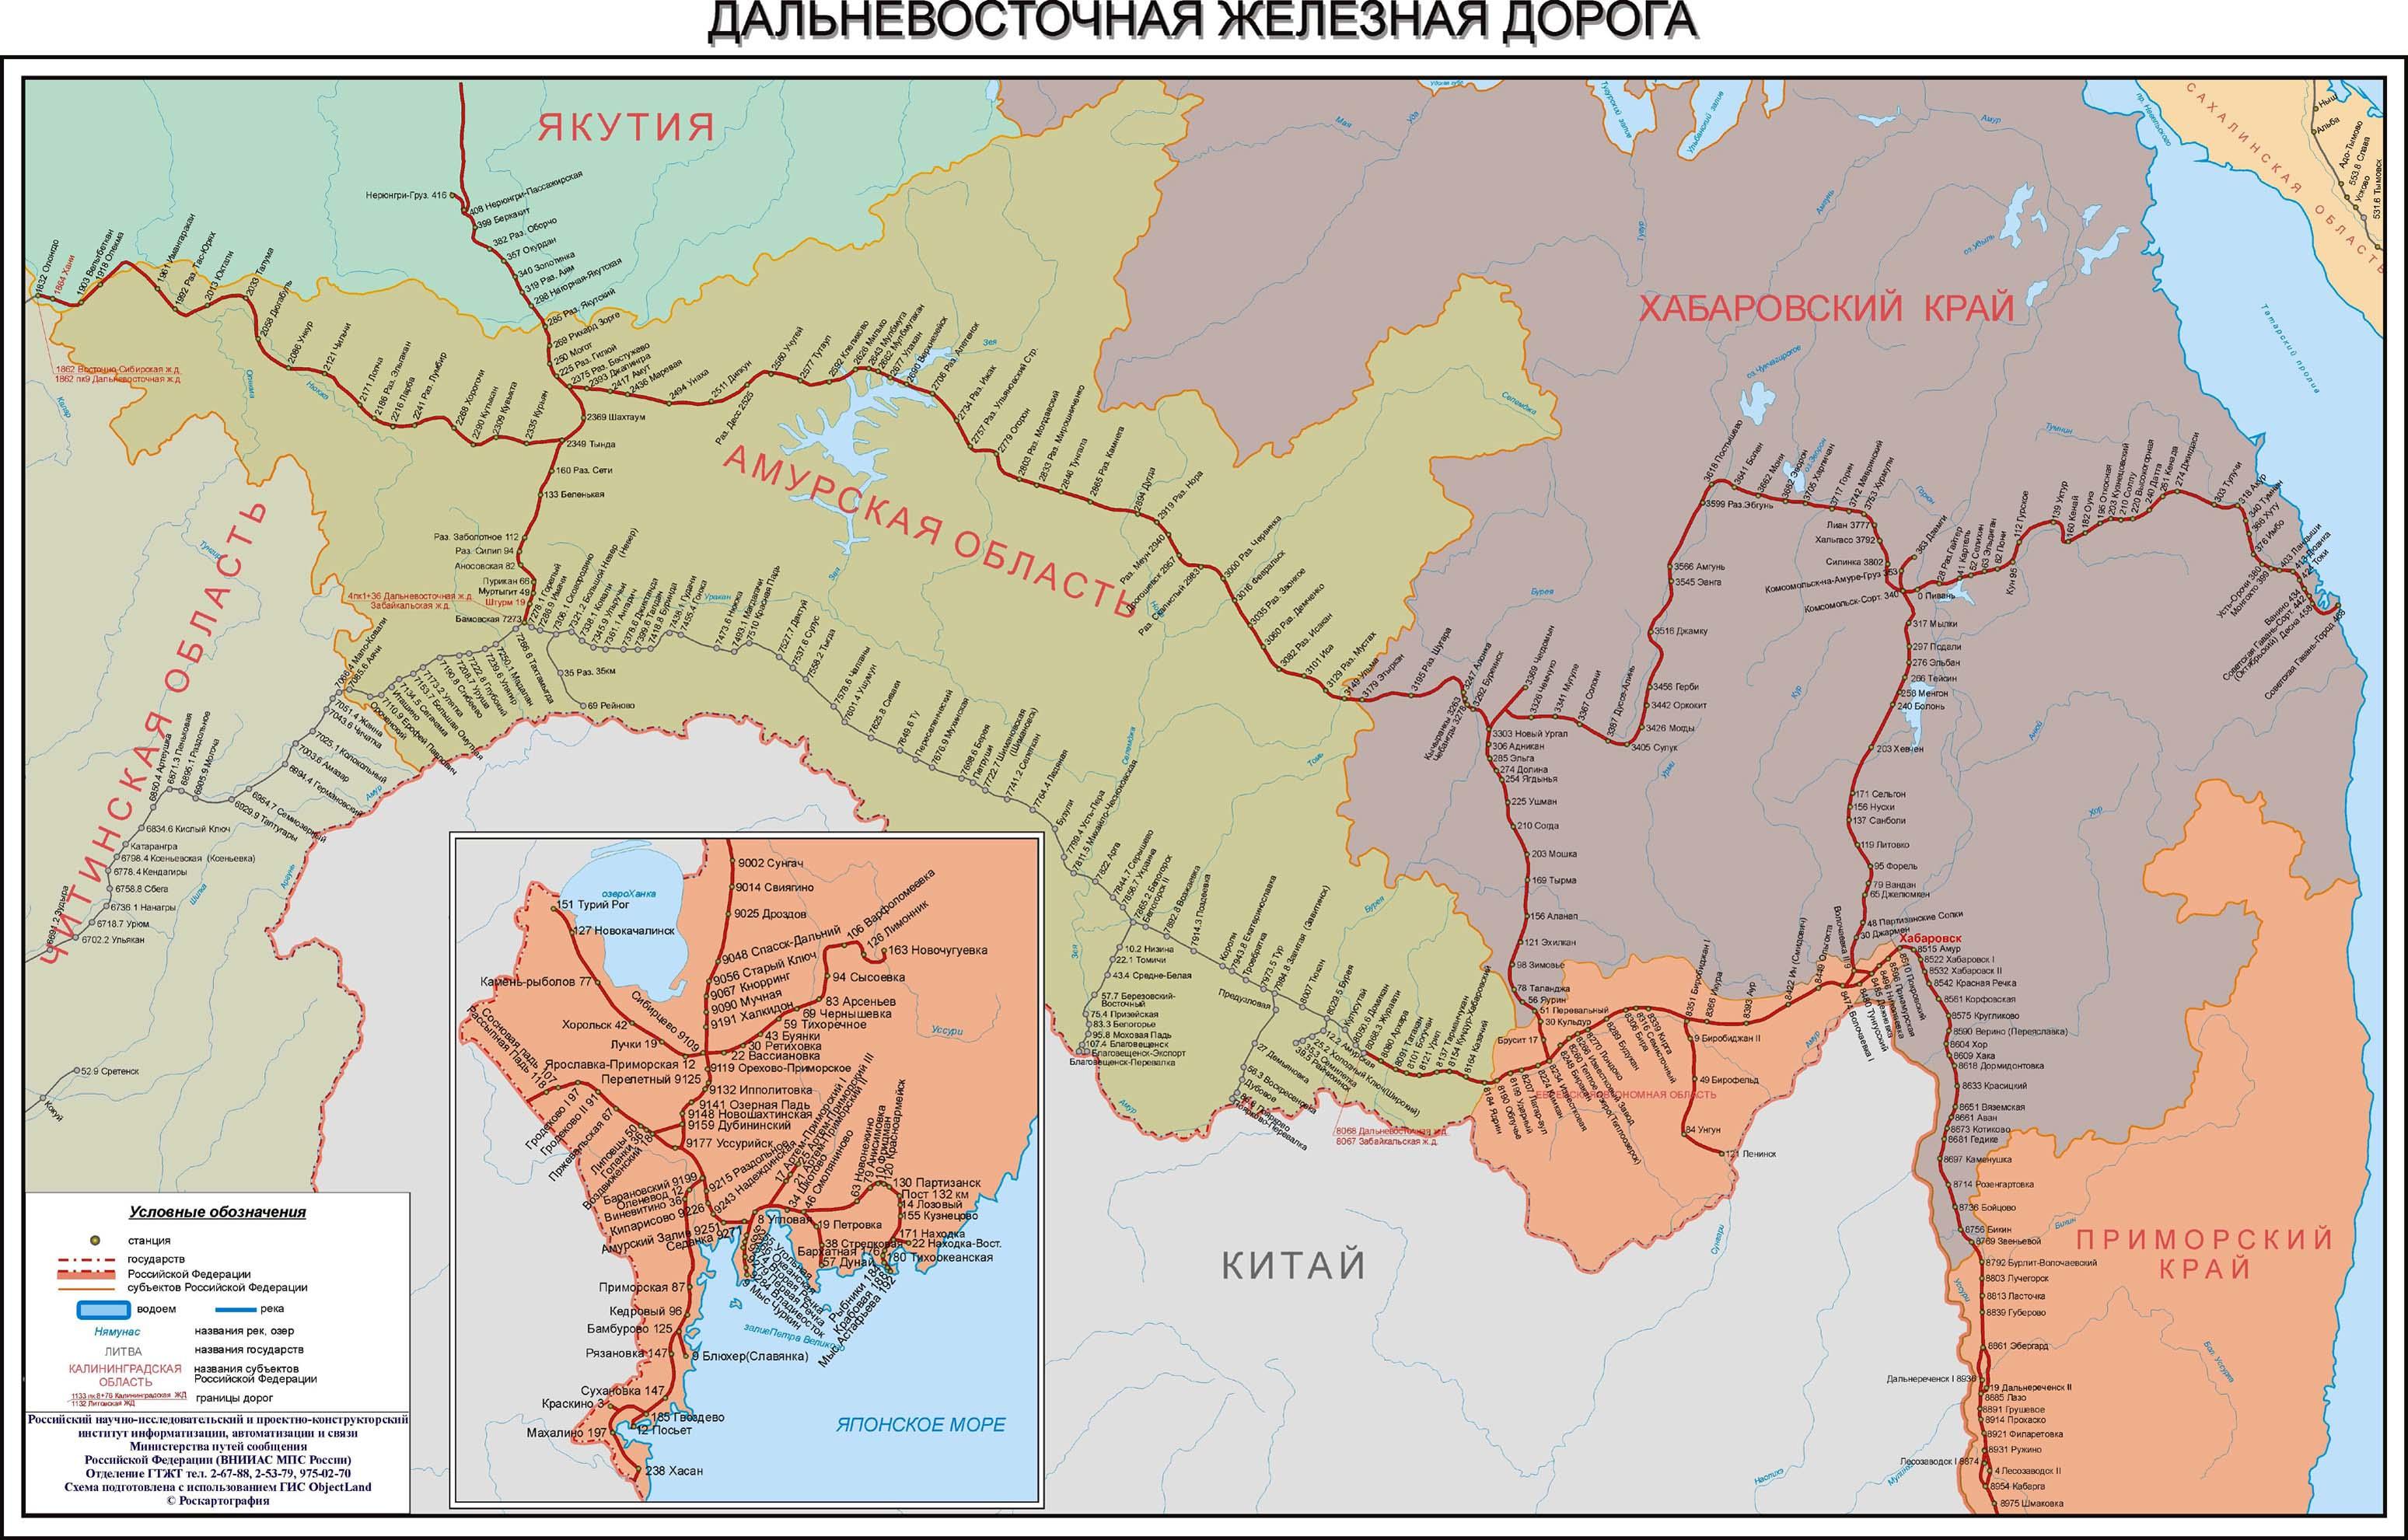 Дальневосточная железная дорога. Карта - cхема: Хабаровск ...: http://gorod-moskva.ru/transport/zd/dalnevostochnaya.php